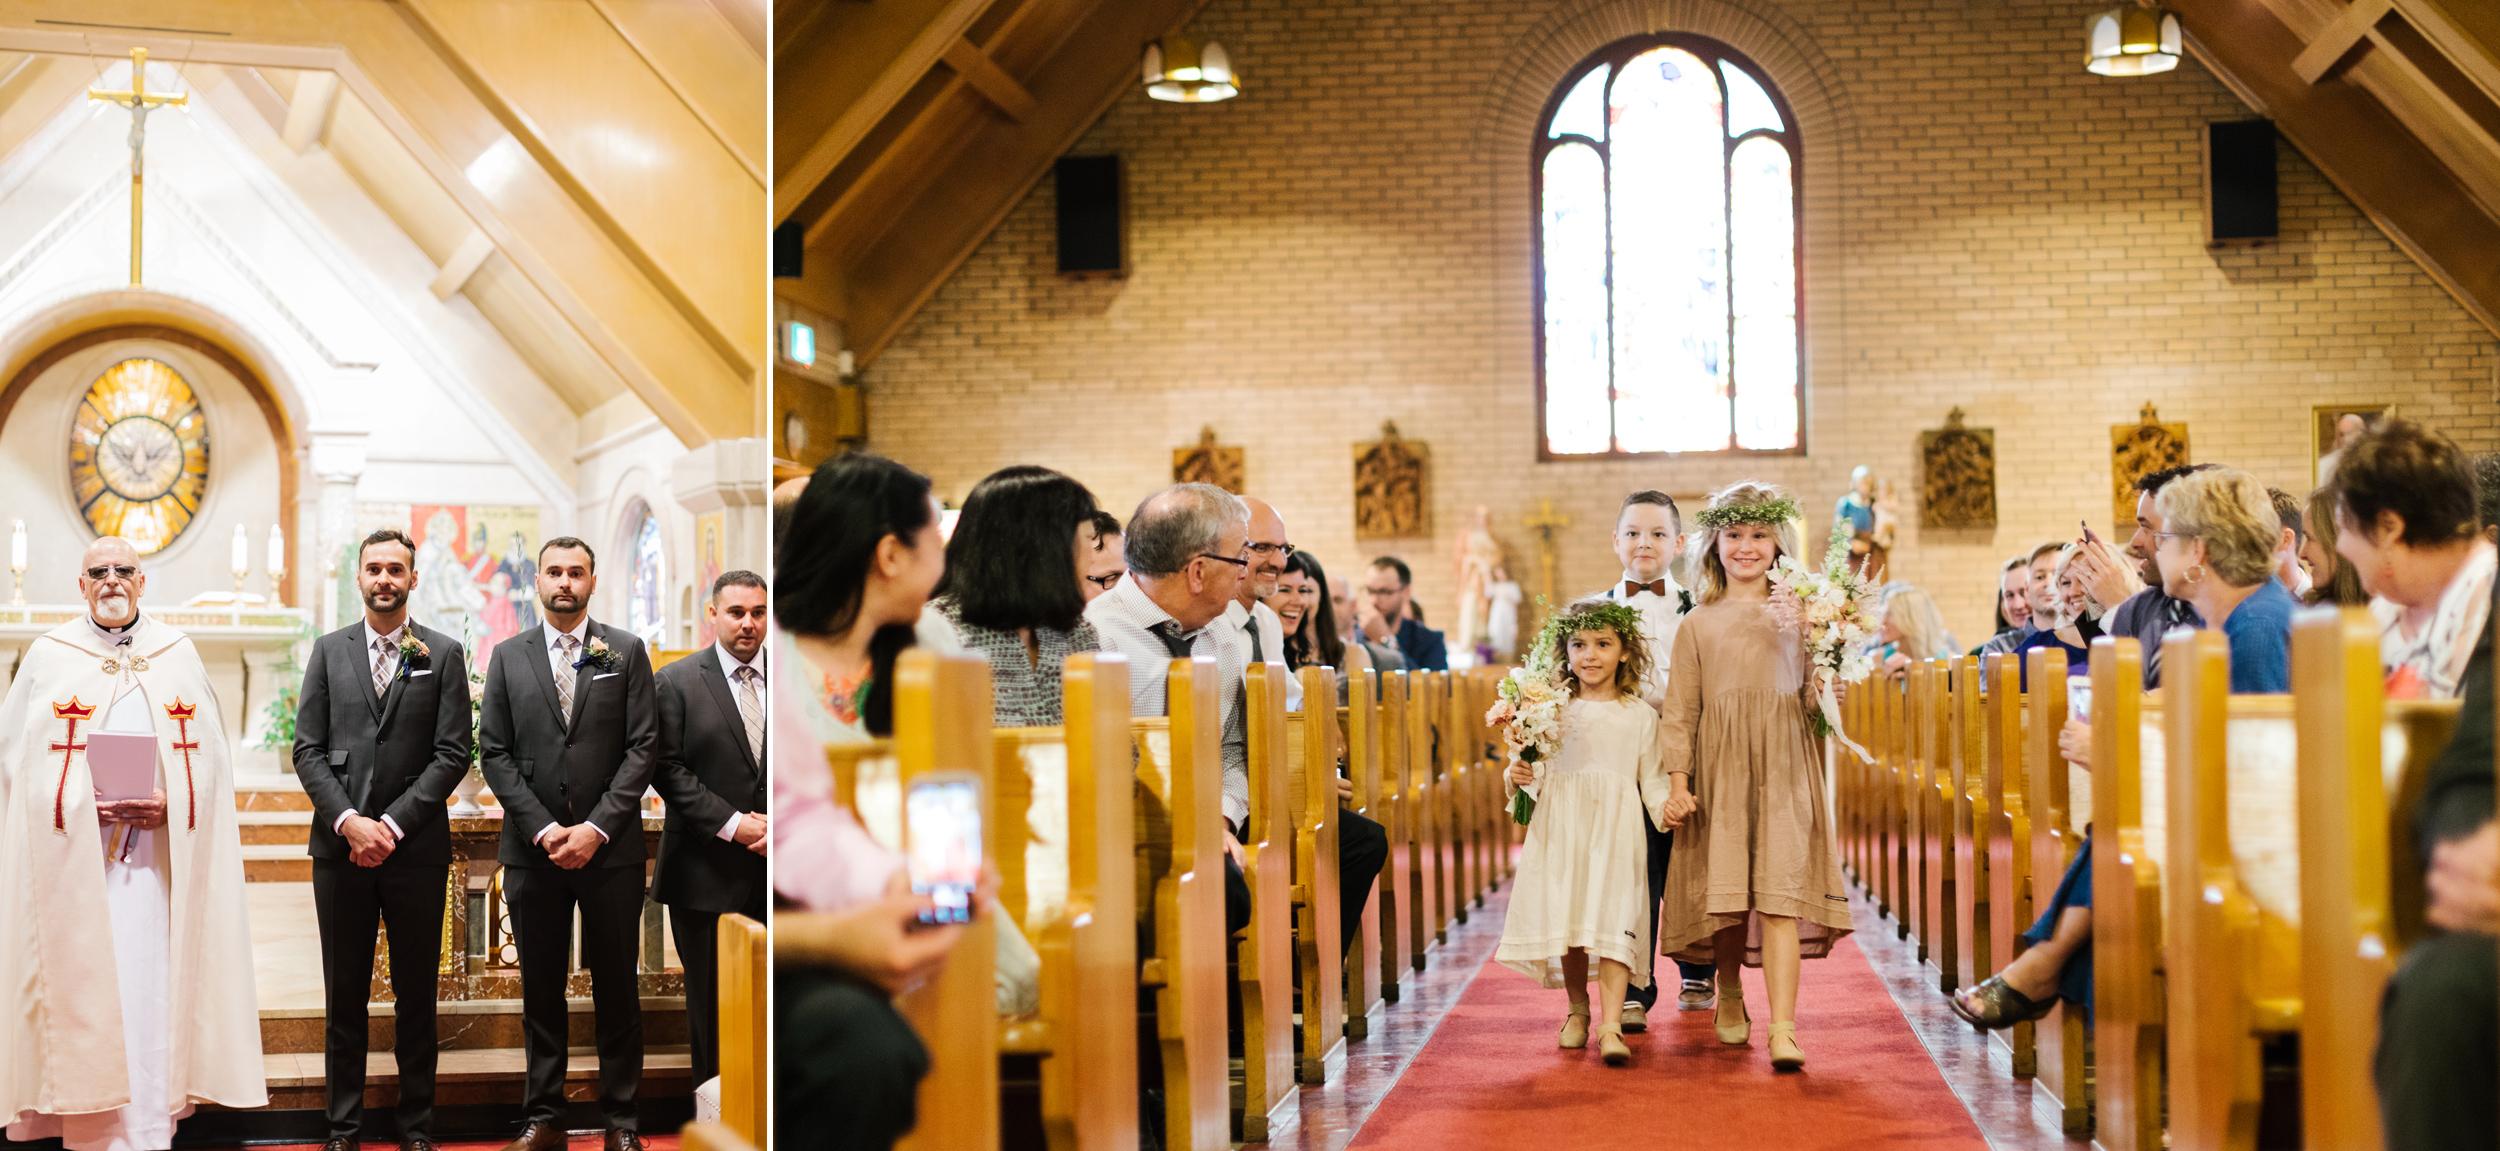 Canmore_Wedding_Photographers0009.jpg